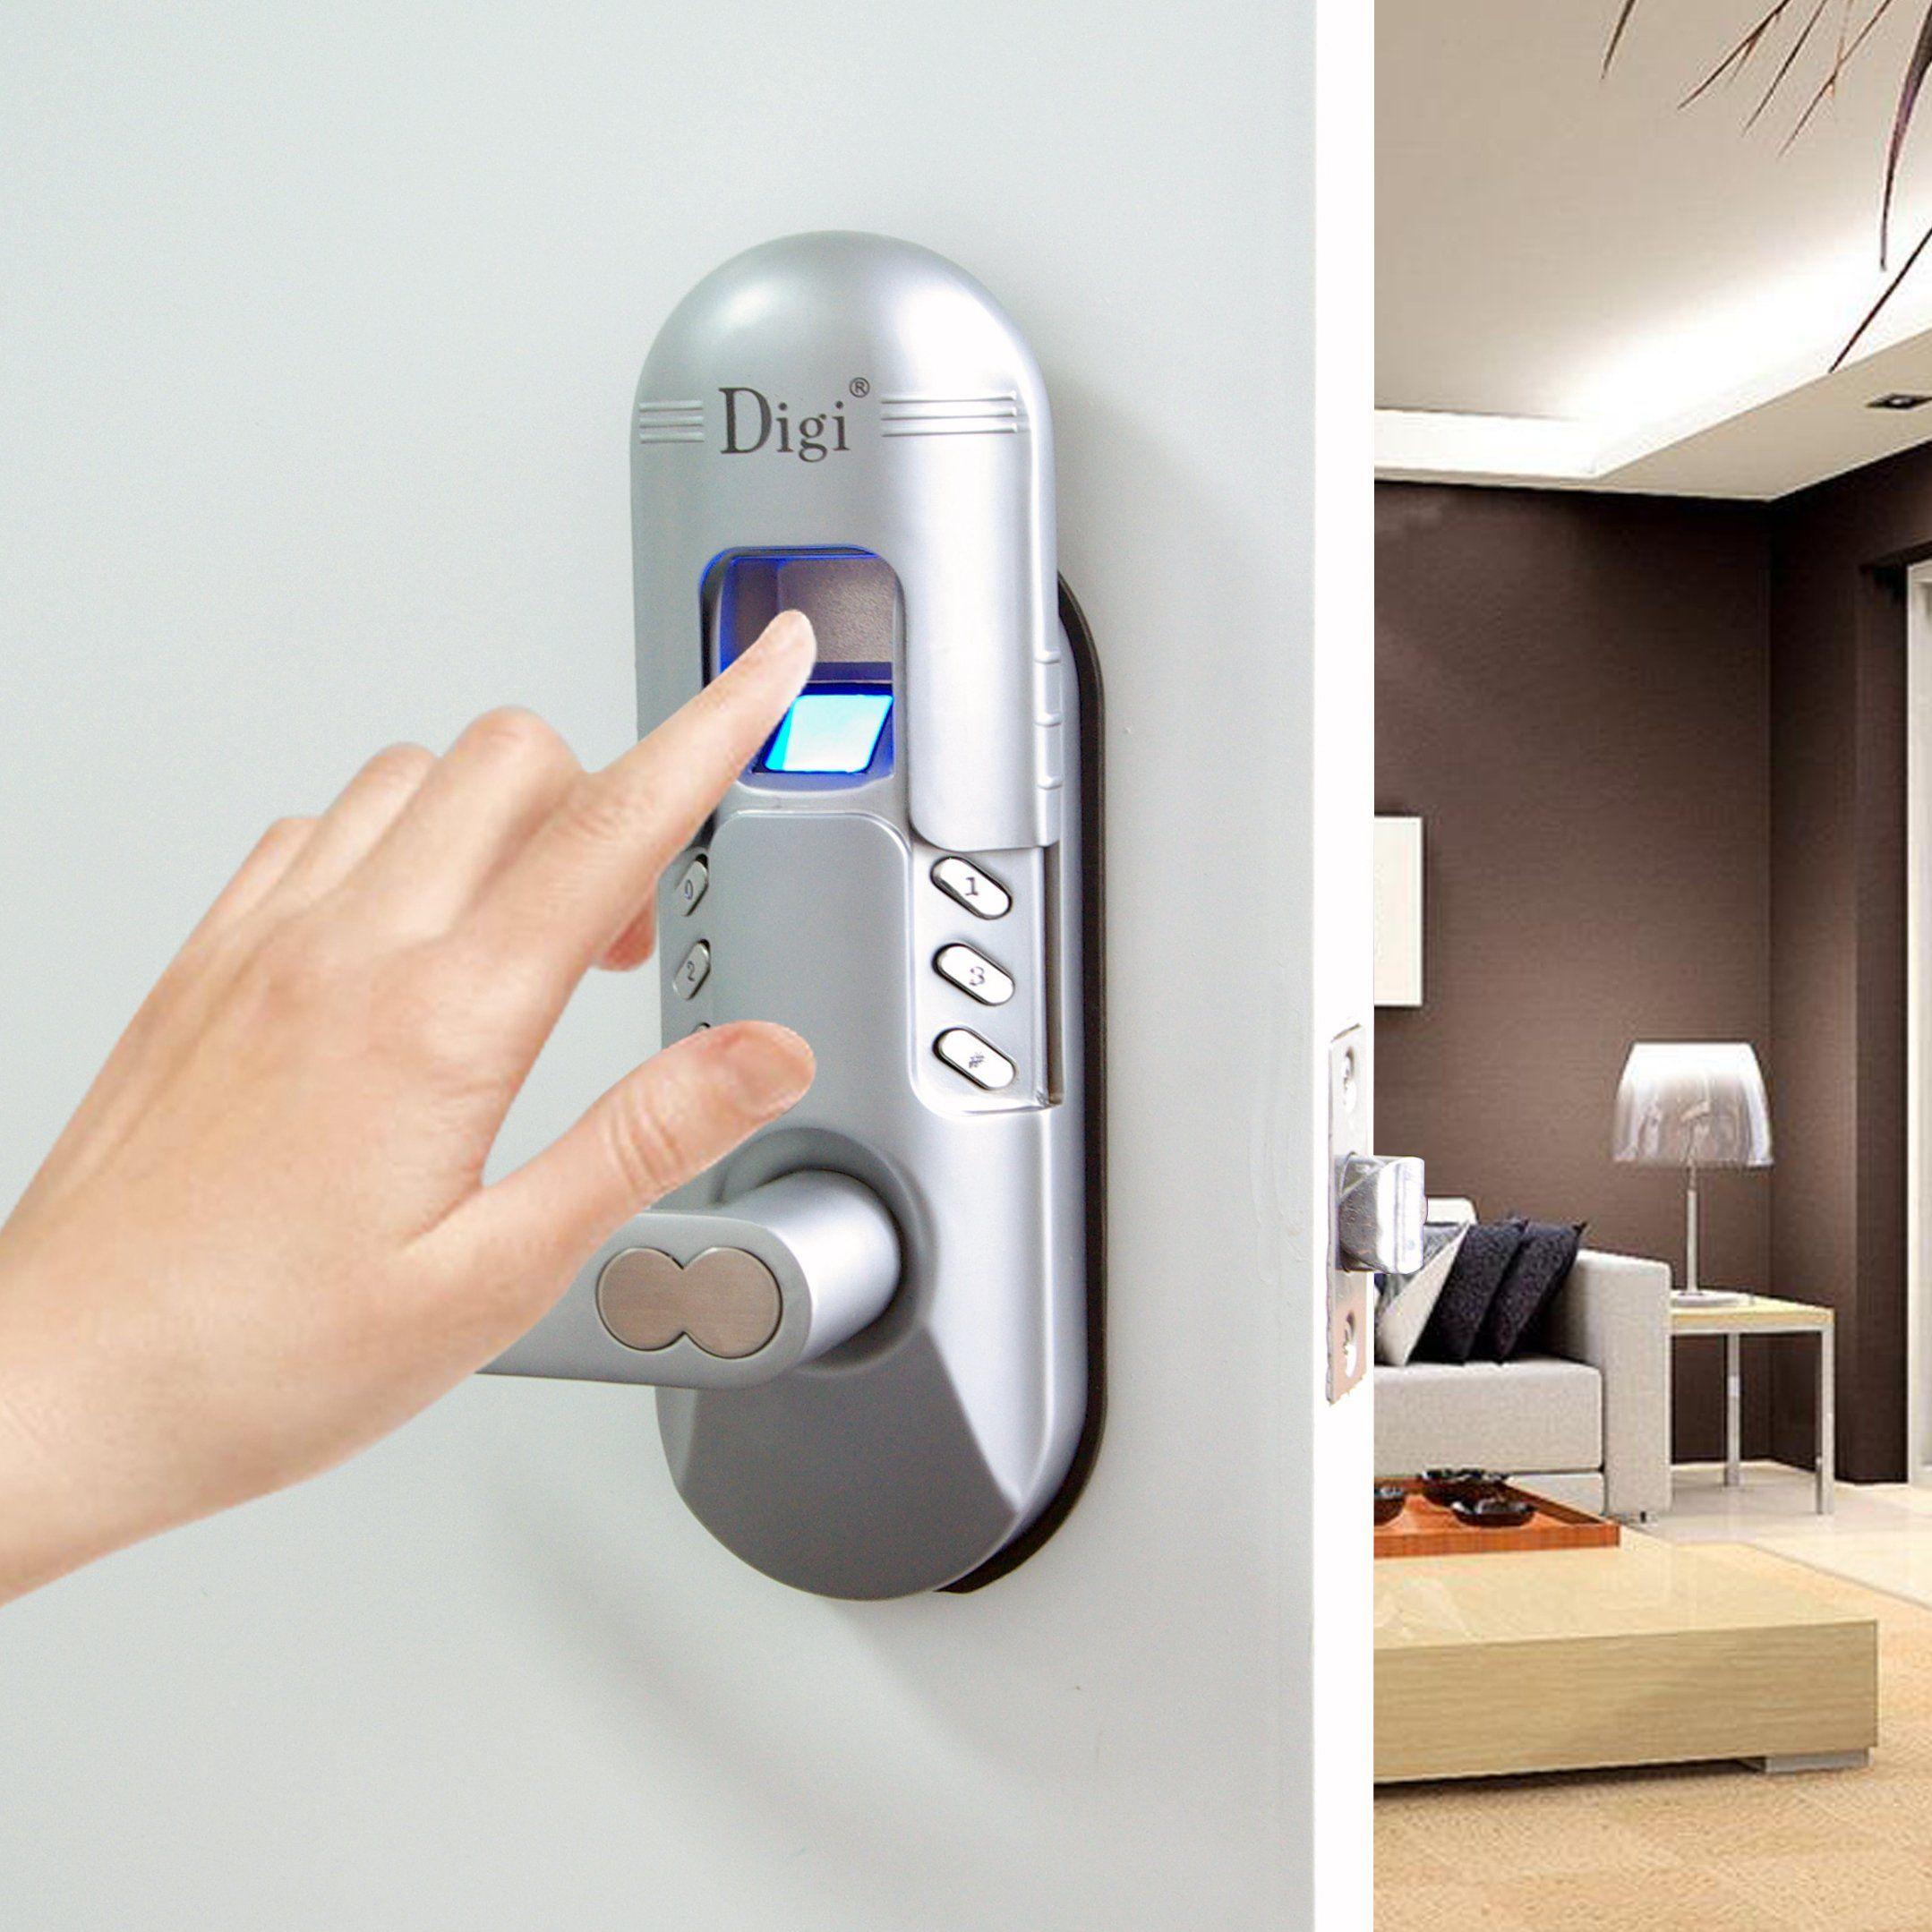 Assa Abloy Digi Electronic Digital Security Fingerprint And Keypad Keyless Door Lock 6600 98 Left Fingerprint Door Lock Smart Home Security Keyless Door Lock